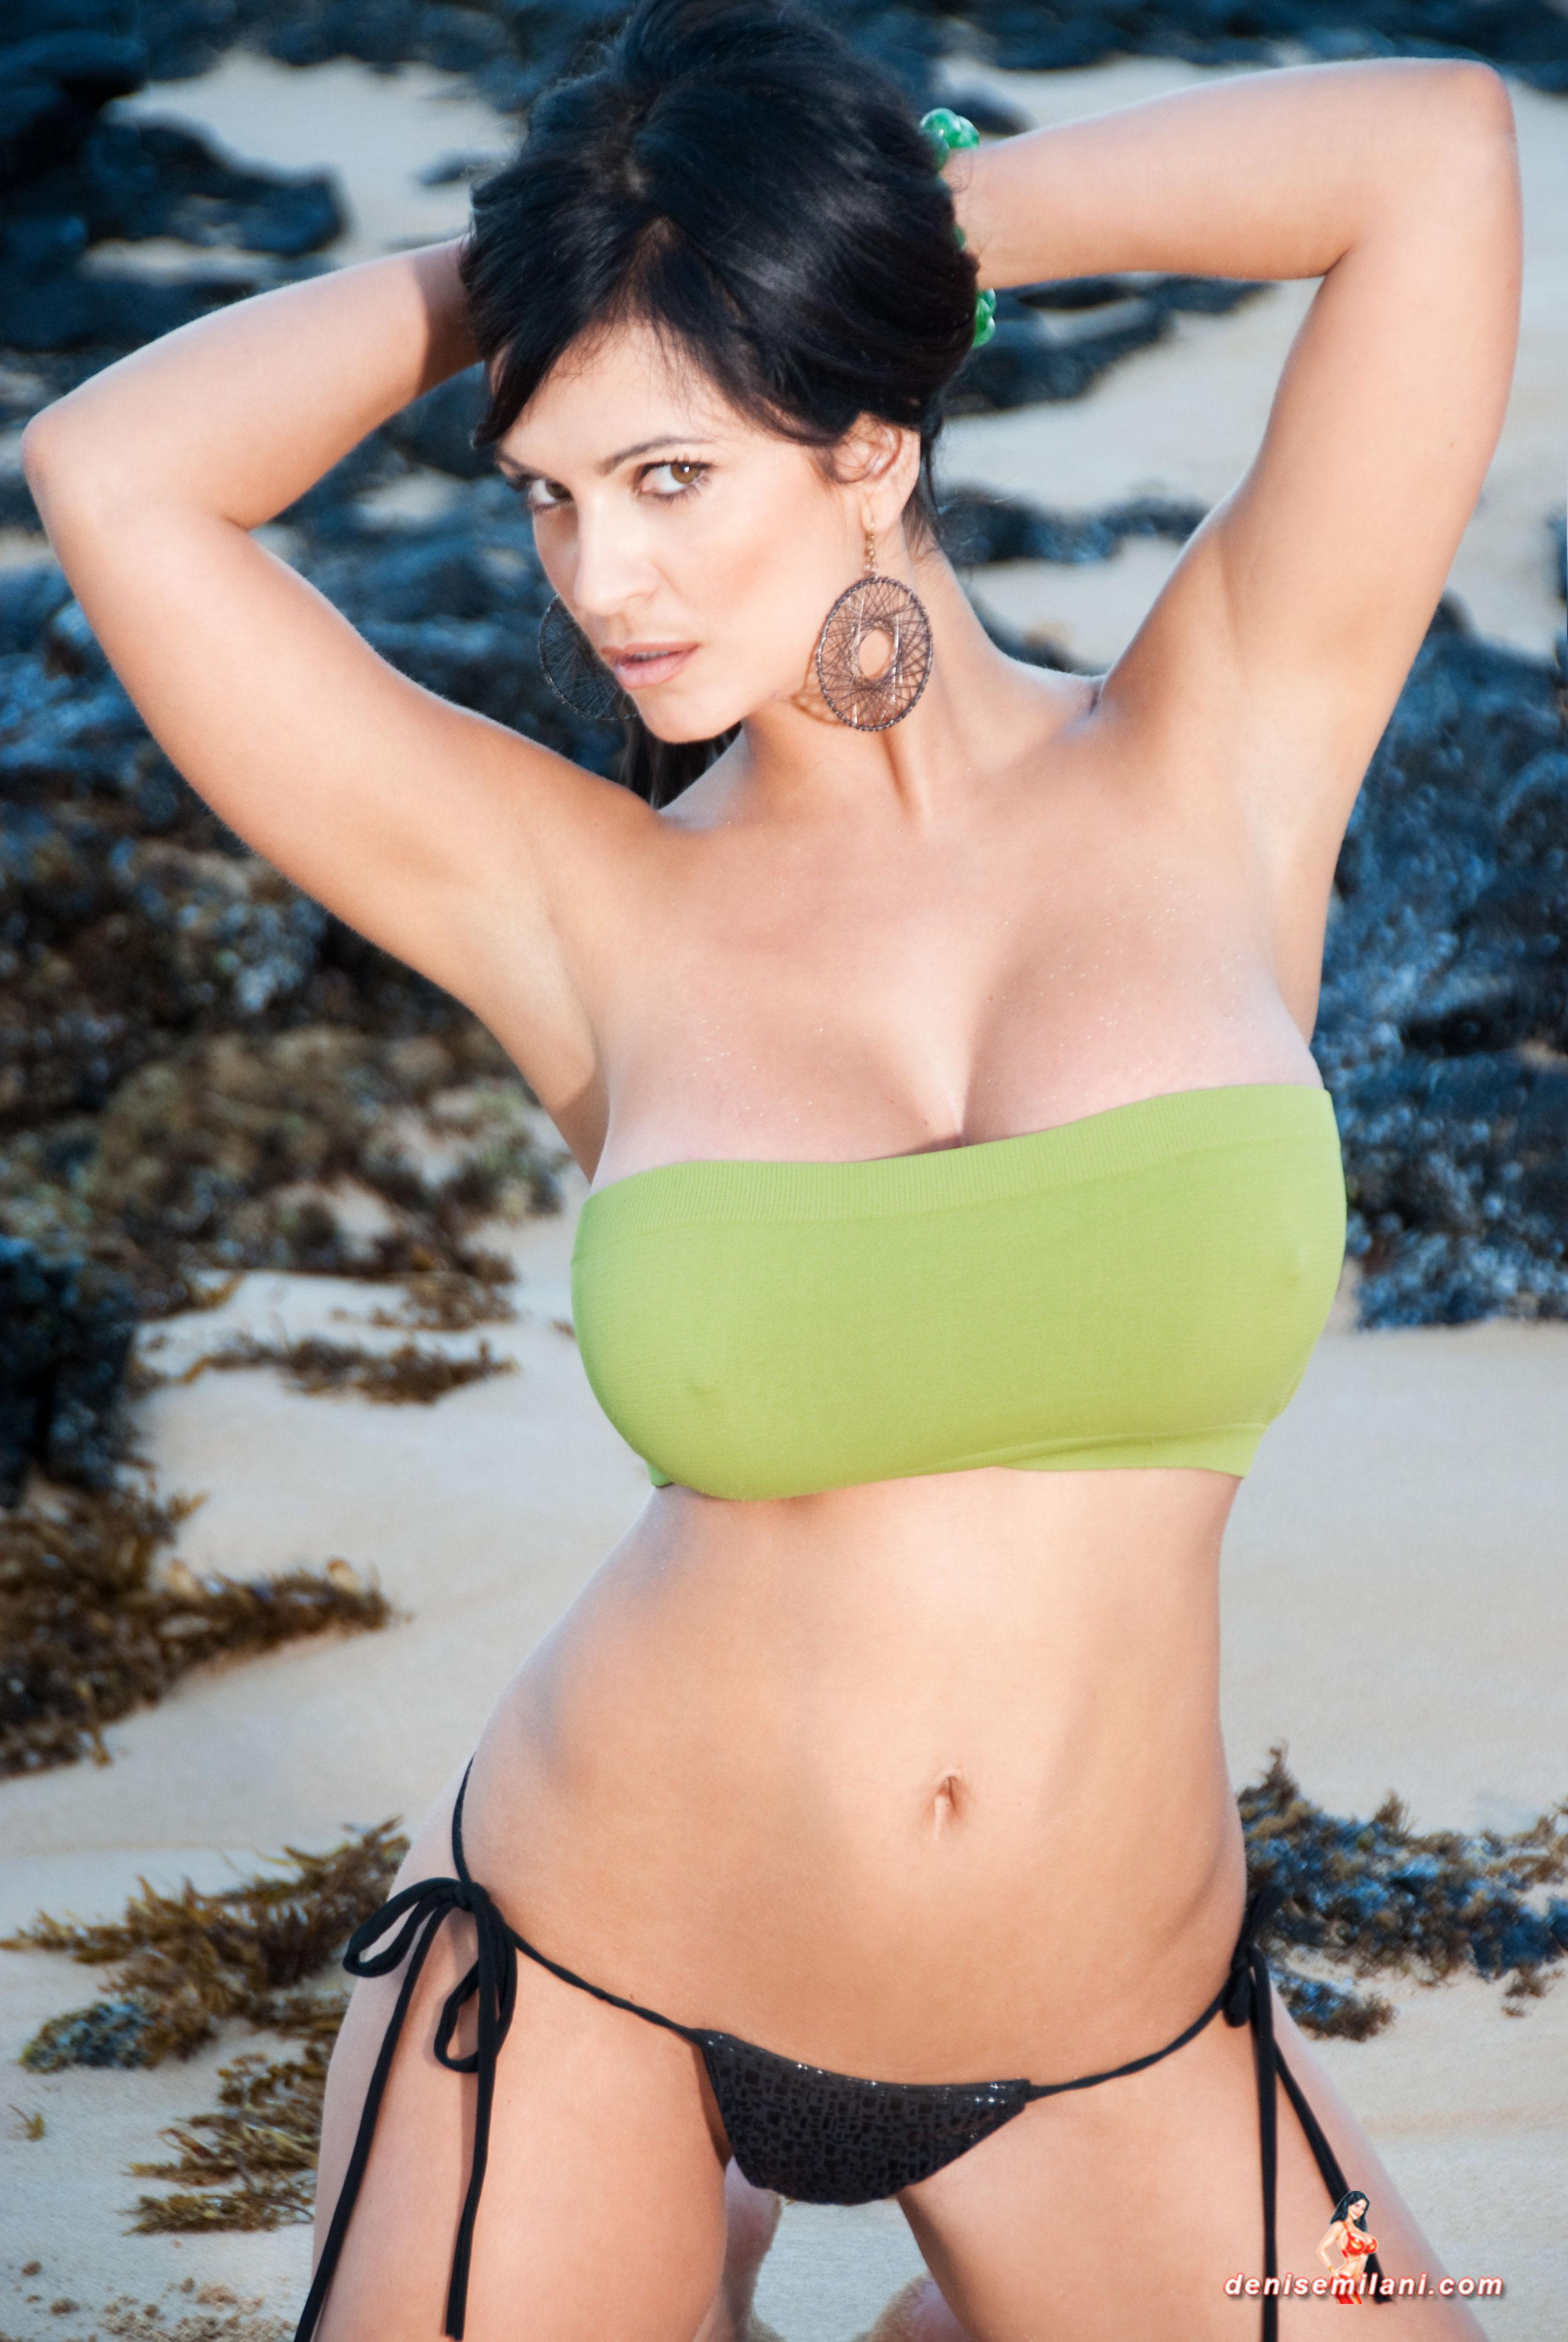 Can, Denise milani white bikini pity